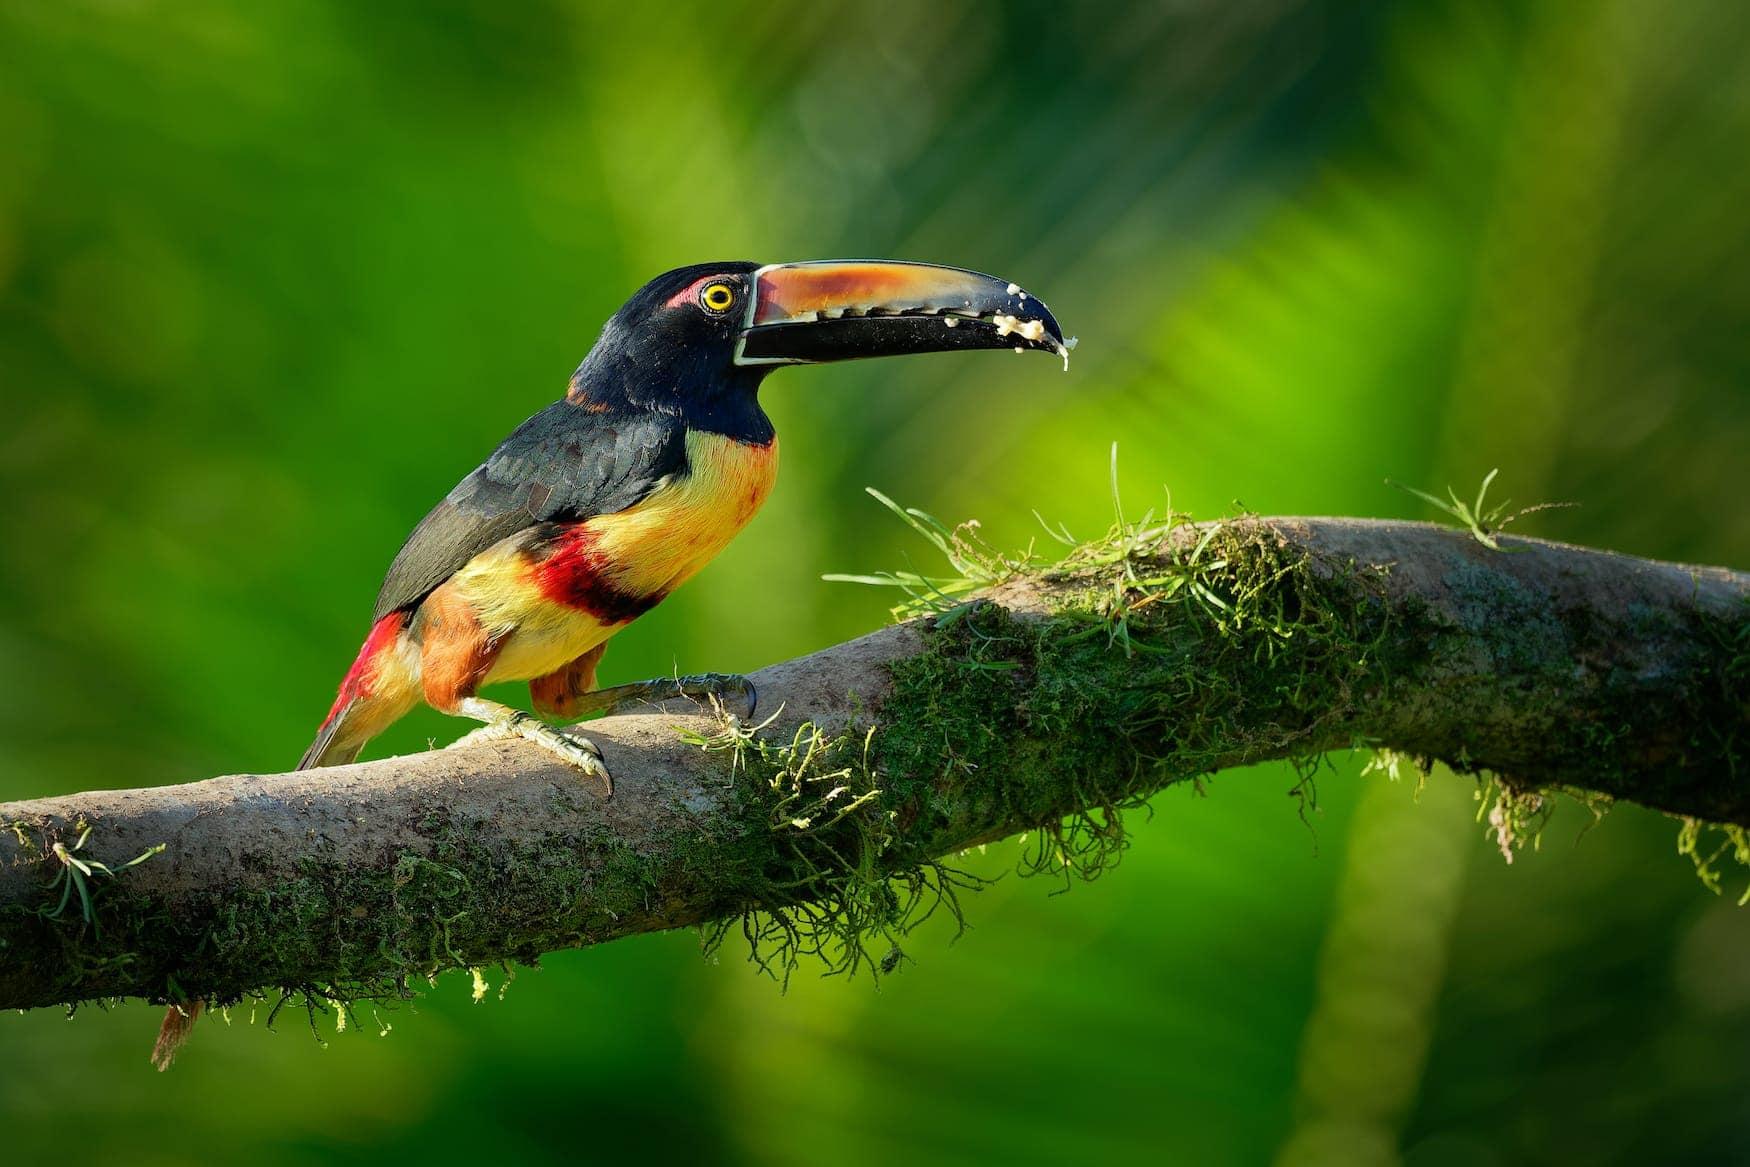 Bunter Tukan auf Ast in Regenwald in Panama